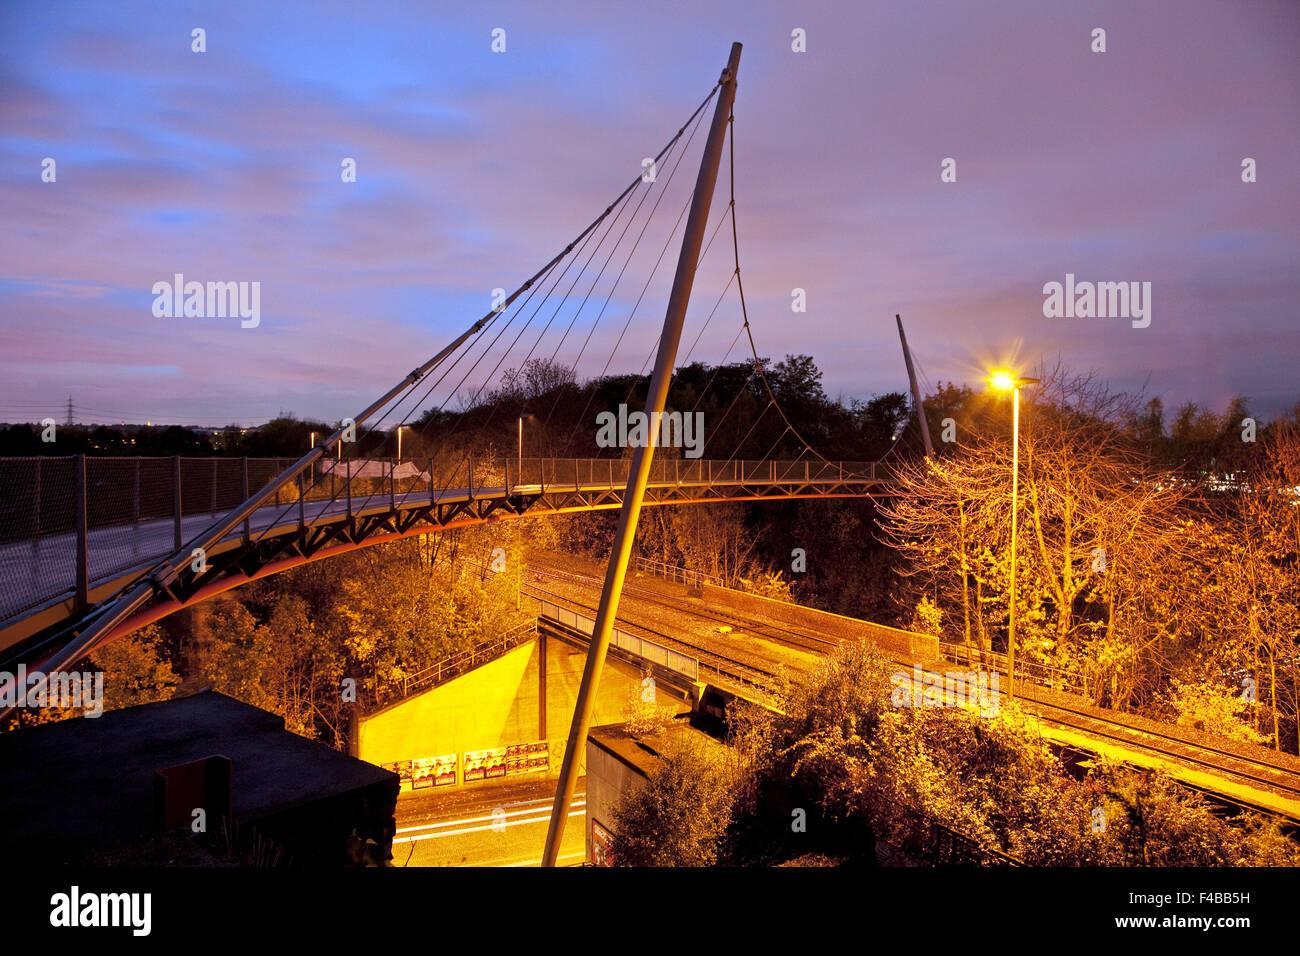 bahnschwinge in Bochum in Germany. - Stock Image